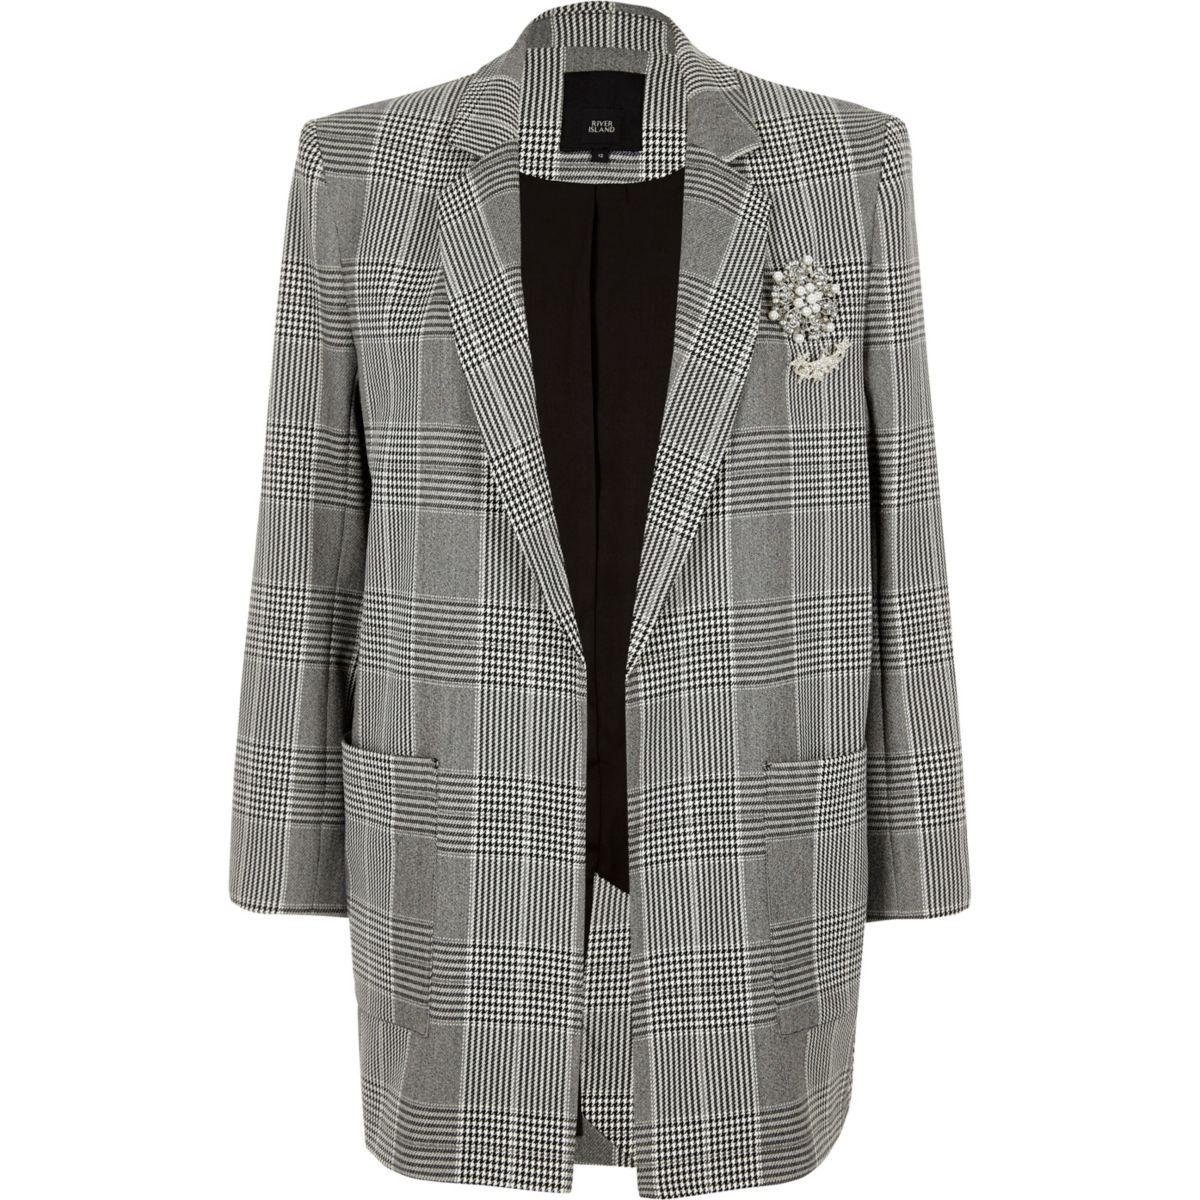 https://www.riverisland.com/p/black-check-brooch-oversized-blazer-711842